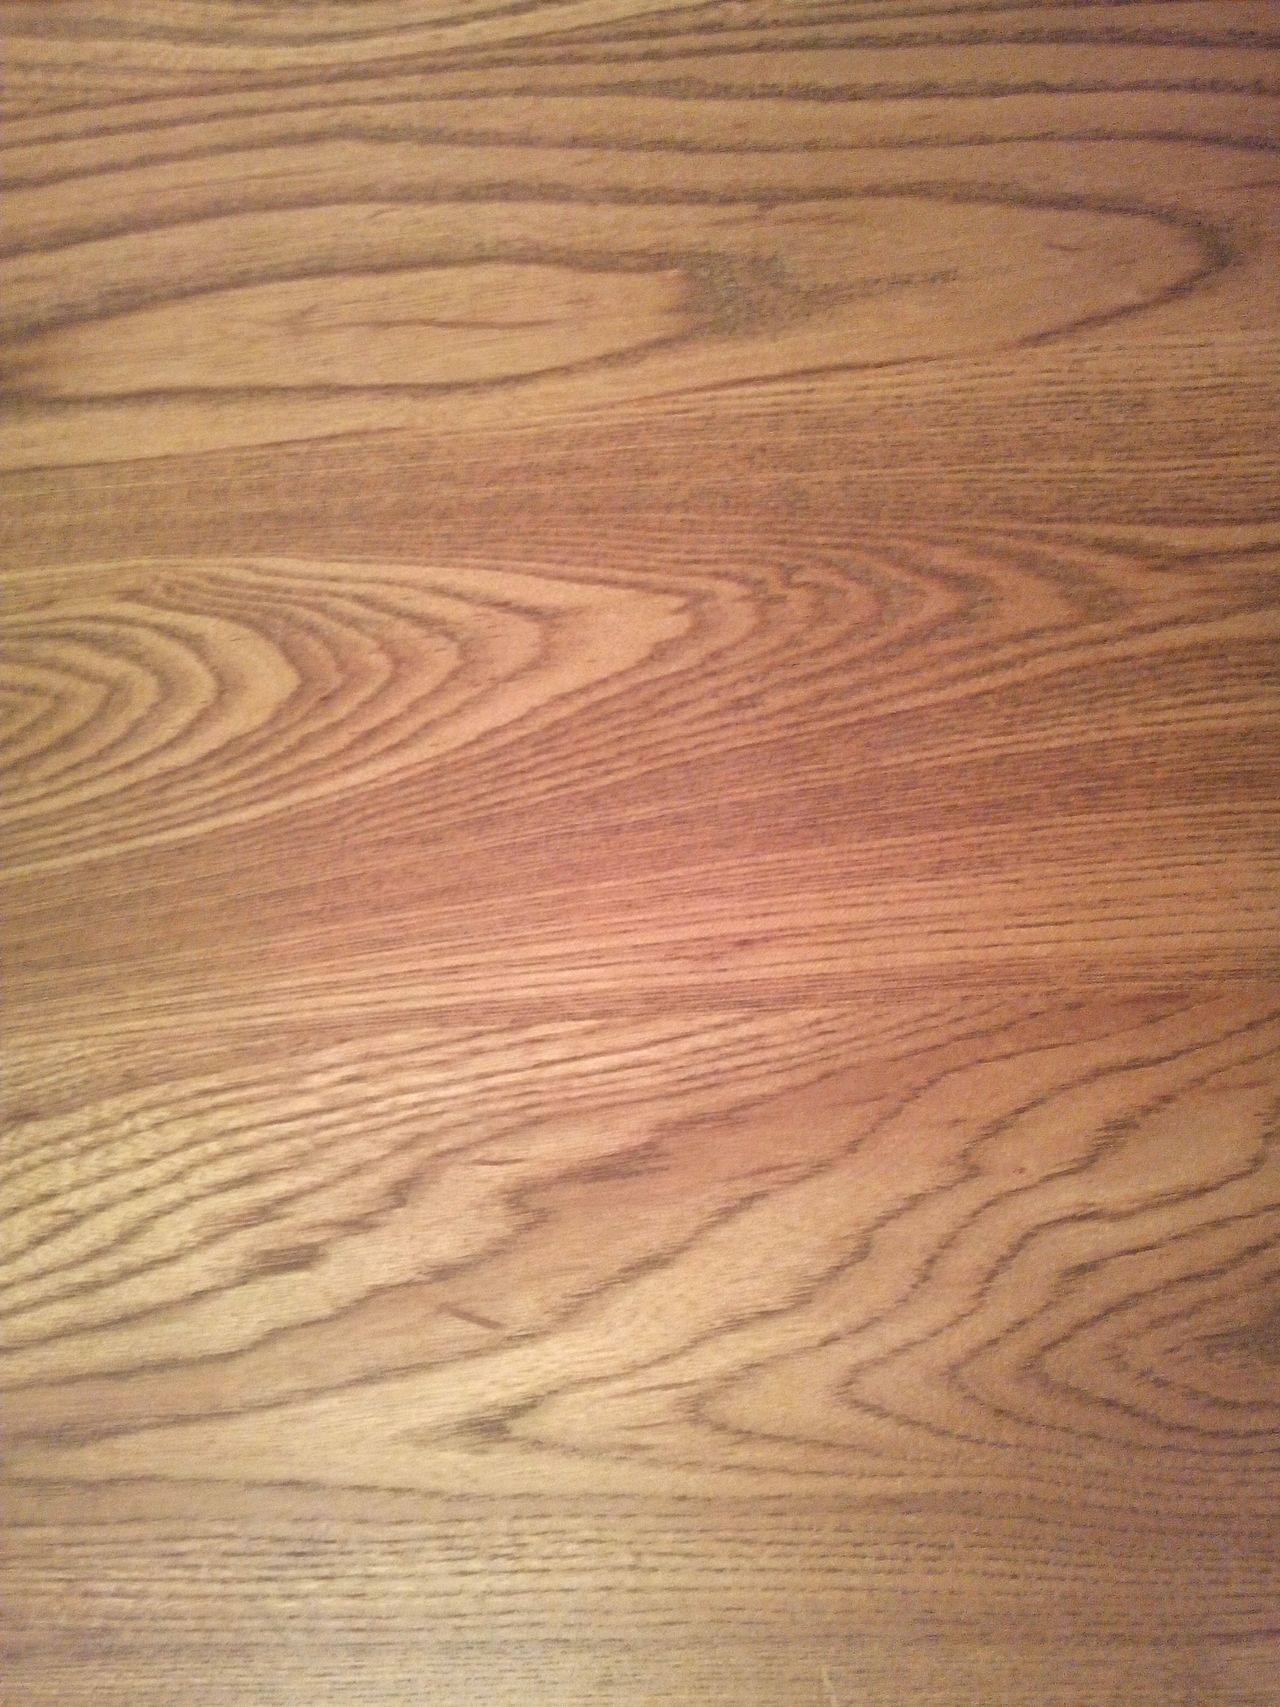 Wood Wood Surface Wooden Texture Textures And Surfaces Surfaces Woods Madera Corte Madera Carpenter Nails Wood Madera Carpenter